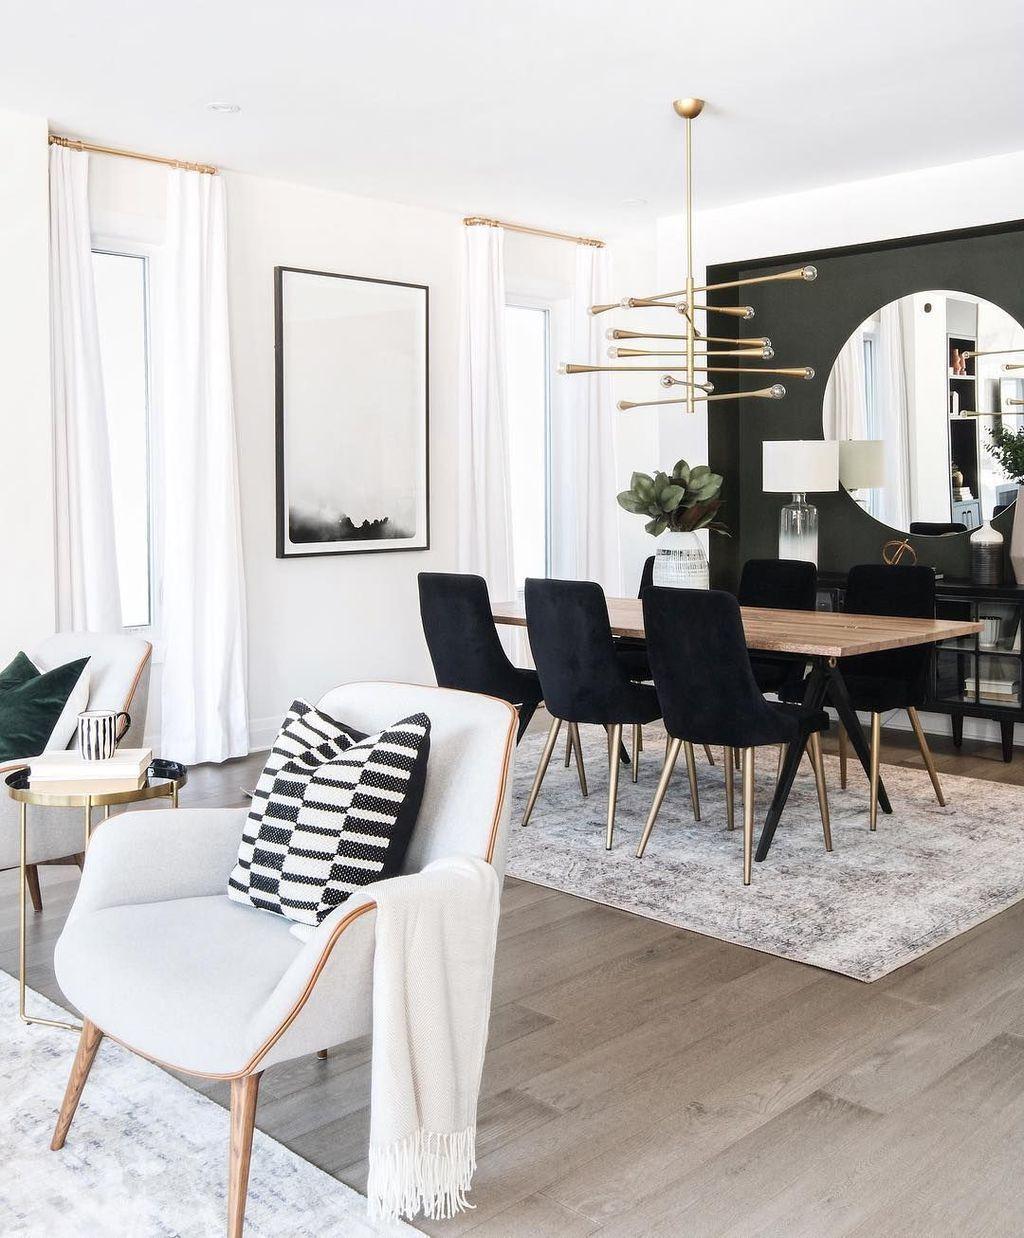 34 Inspiring Modern Dining Room Decor And Design Ideas Dining